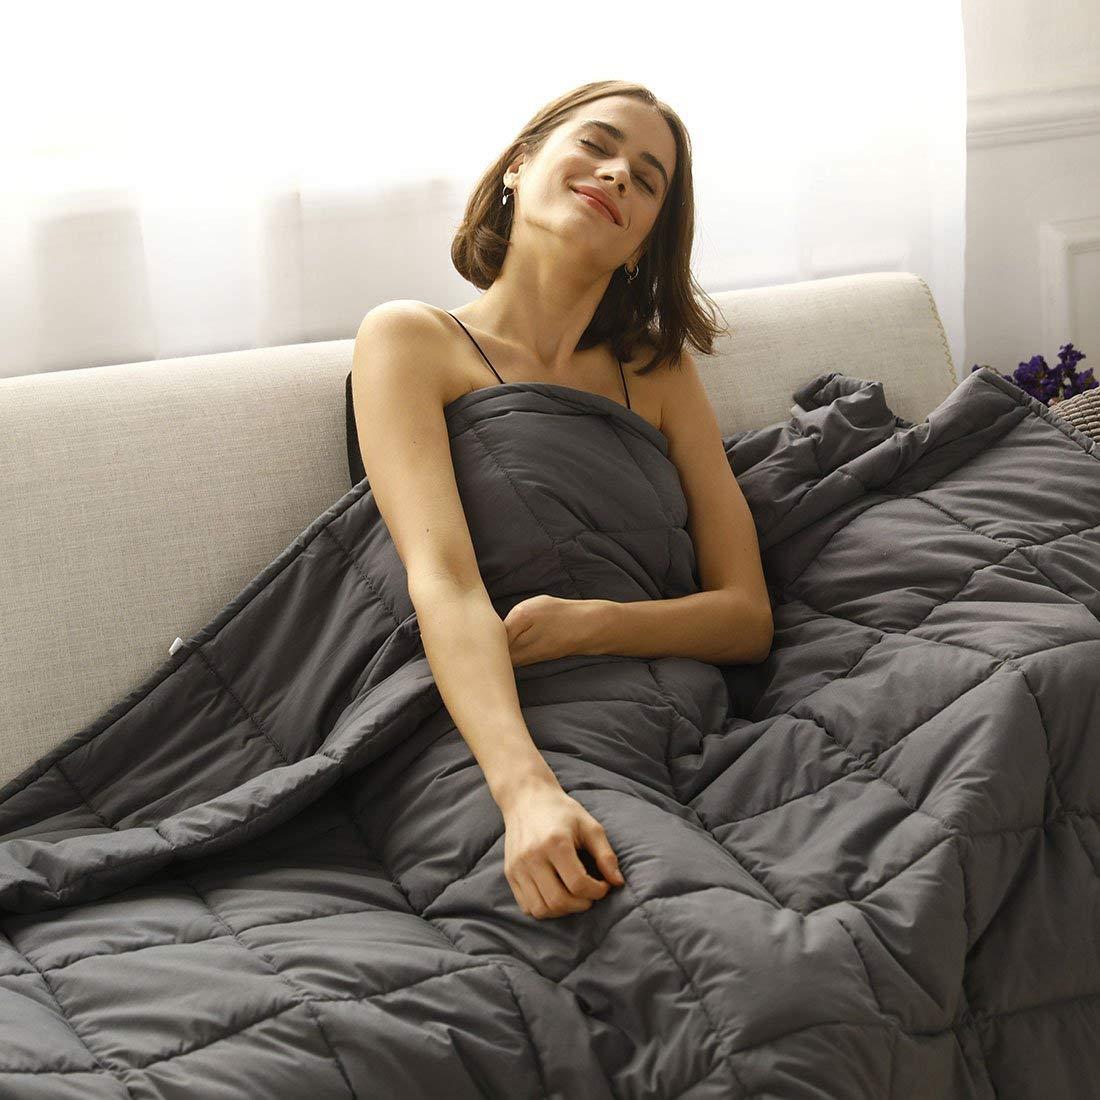 Cool Weighted Gravity Heavy Blanket for Adult Women Men Natural Deep Sleep, Reduce Stress,Anxiety, Autism (Dark Grey) 60*80 inch рубашка laplandic heavy l dark grey l21 2011s